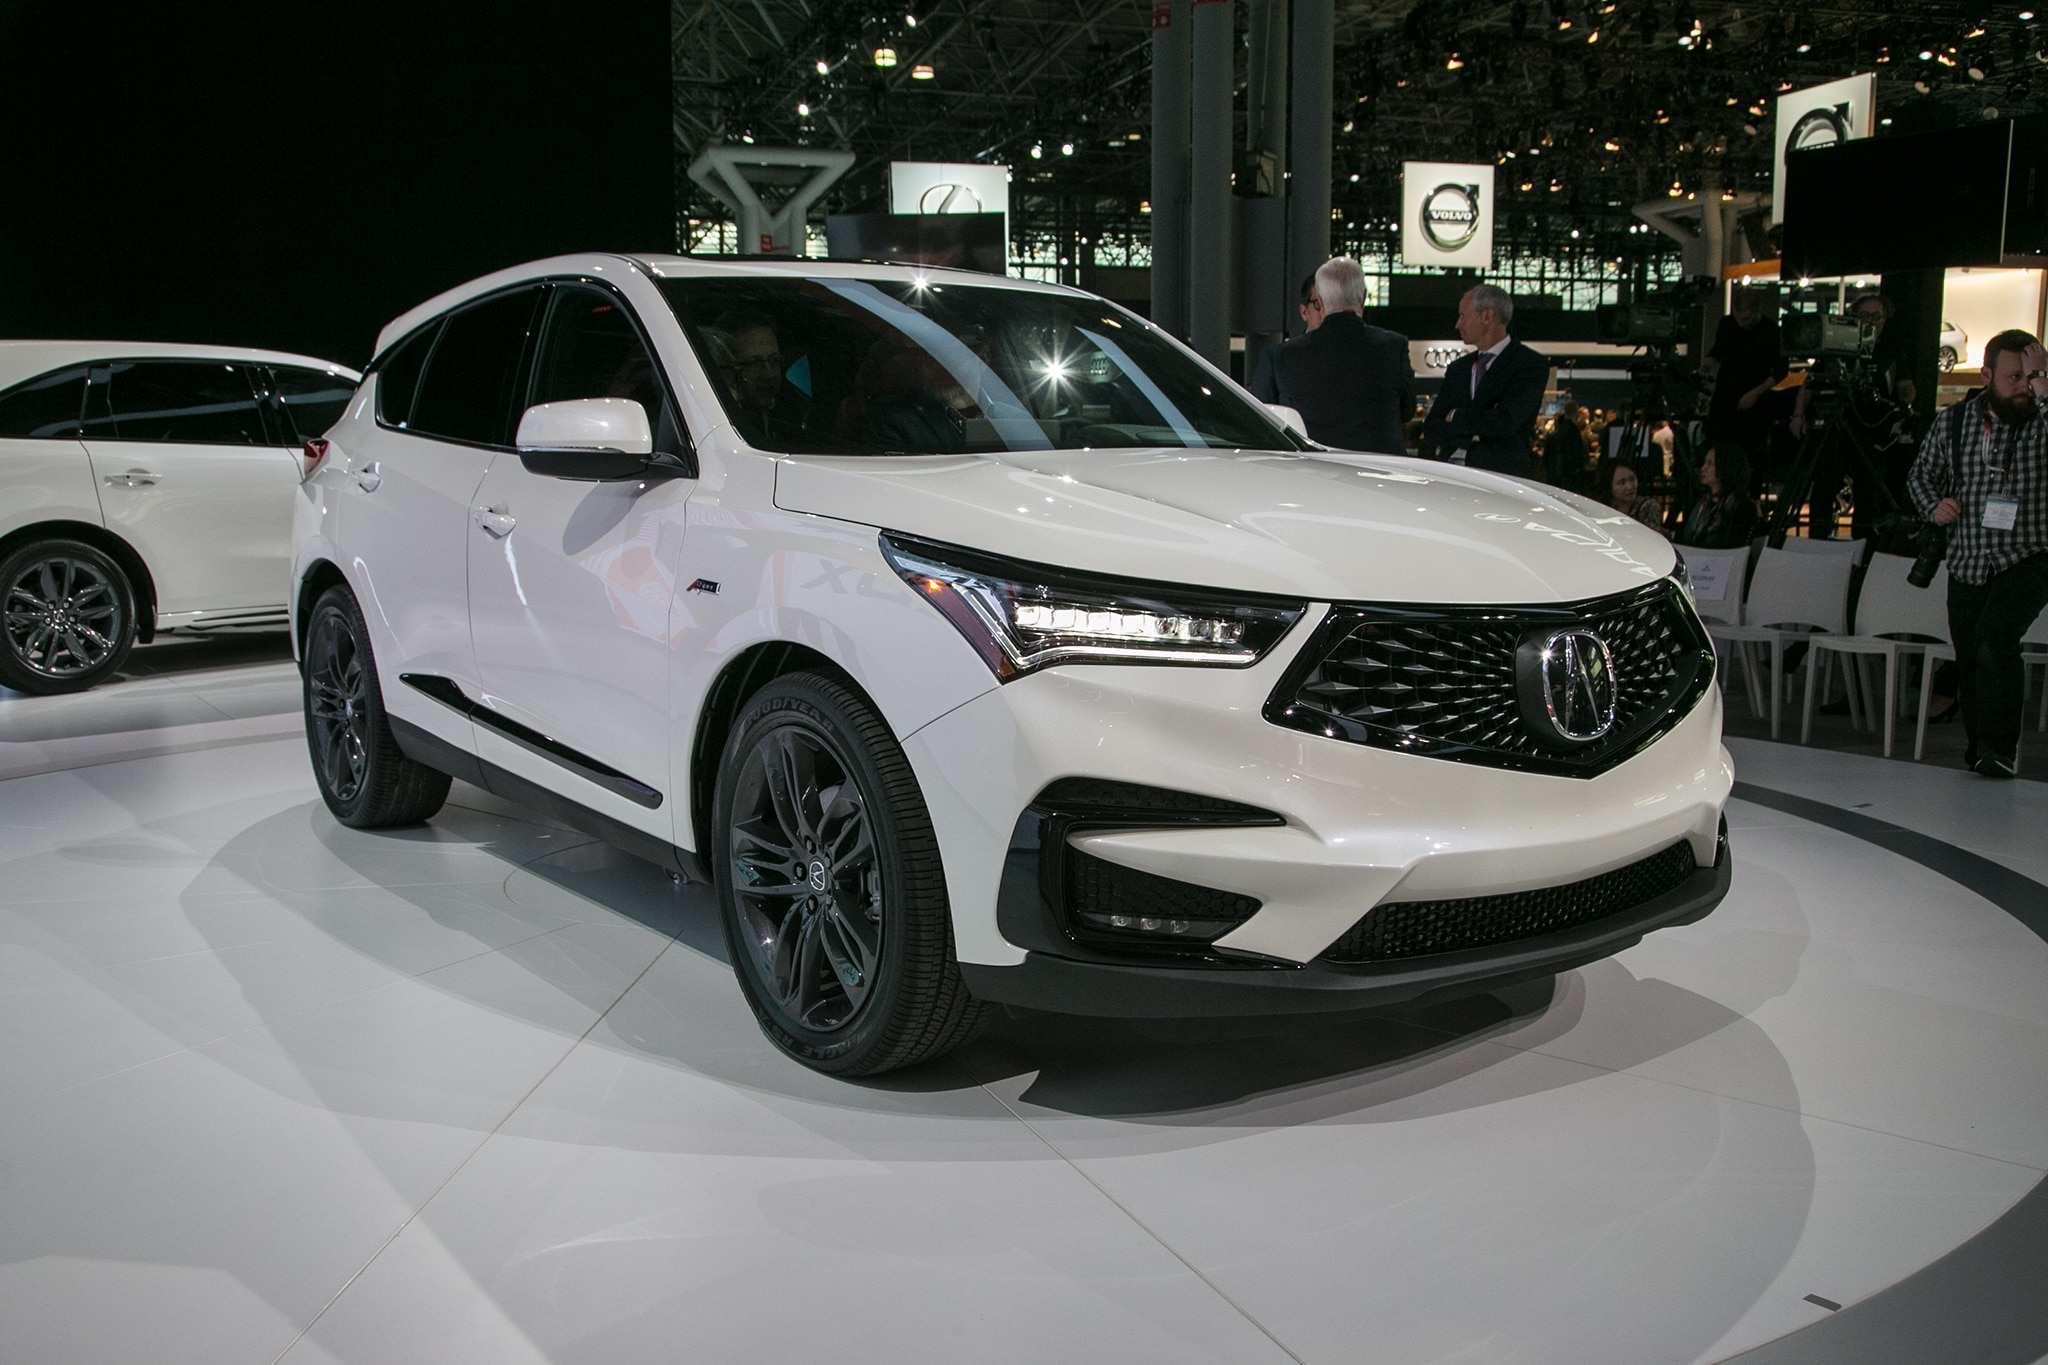 97 New 2019 Acura Price Speed Test for 2019 Acura Price